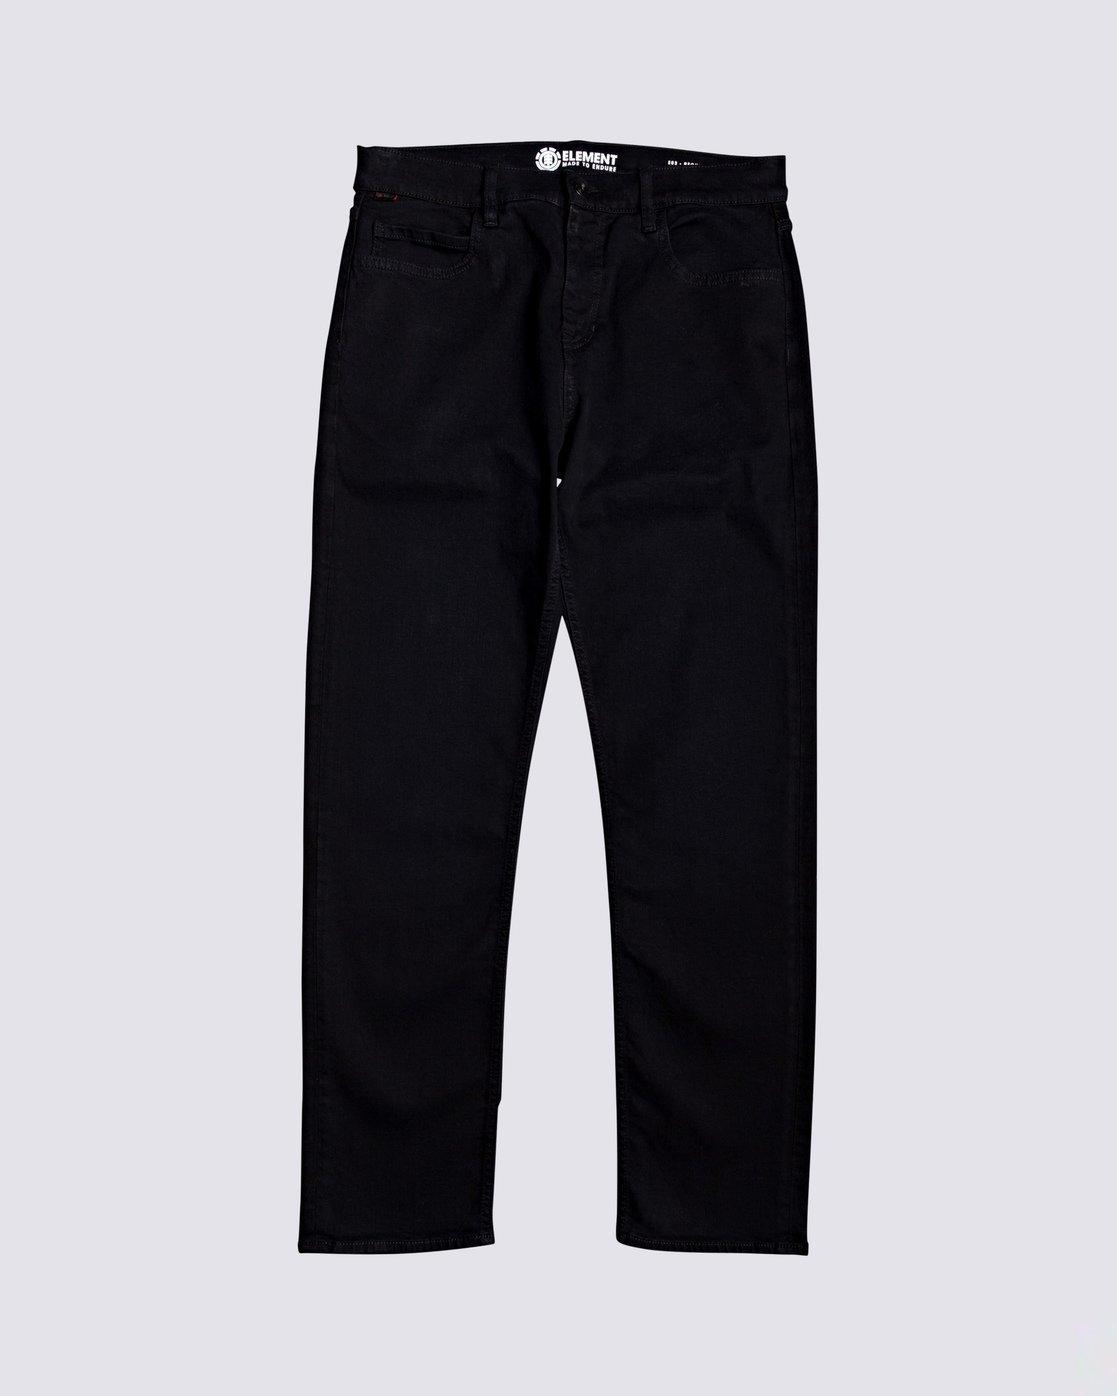 0 E03 Jeans Black M3533E03 Element